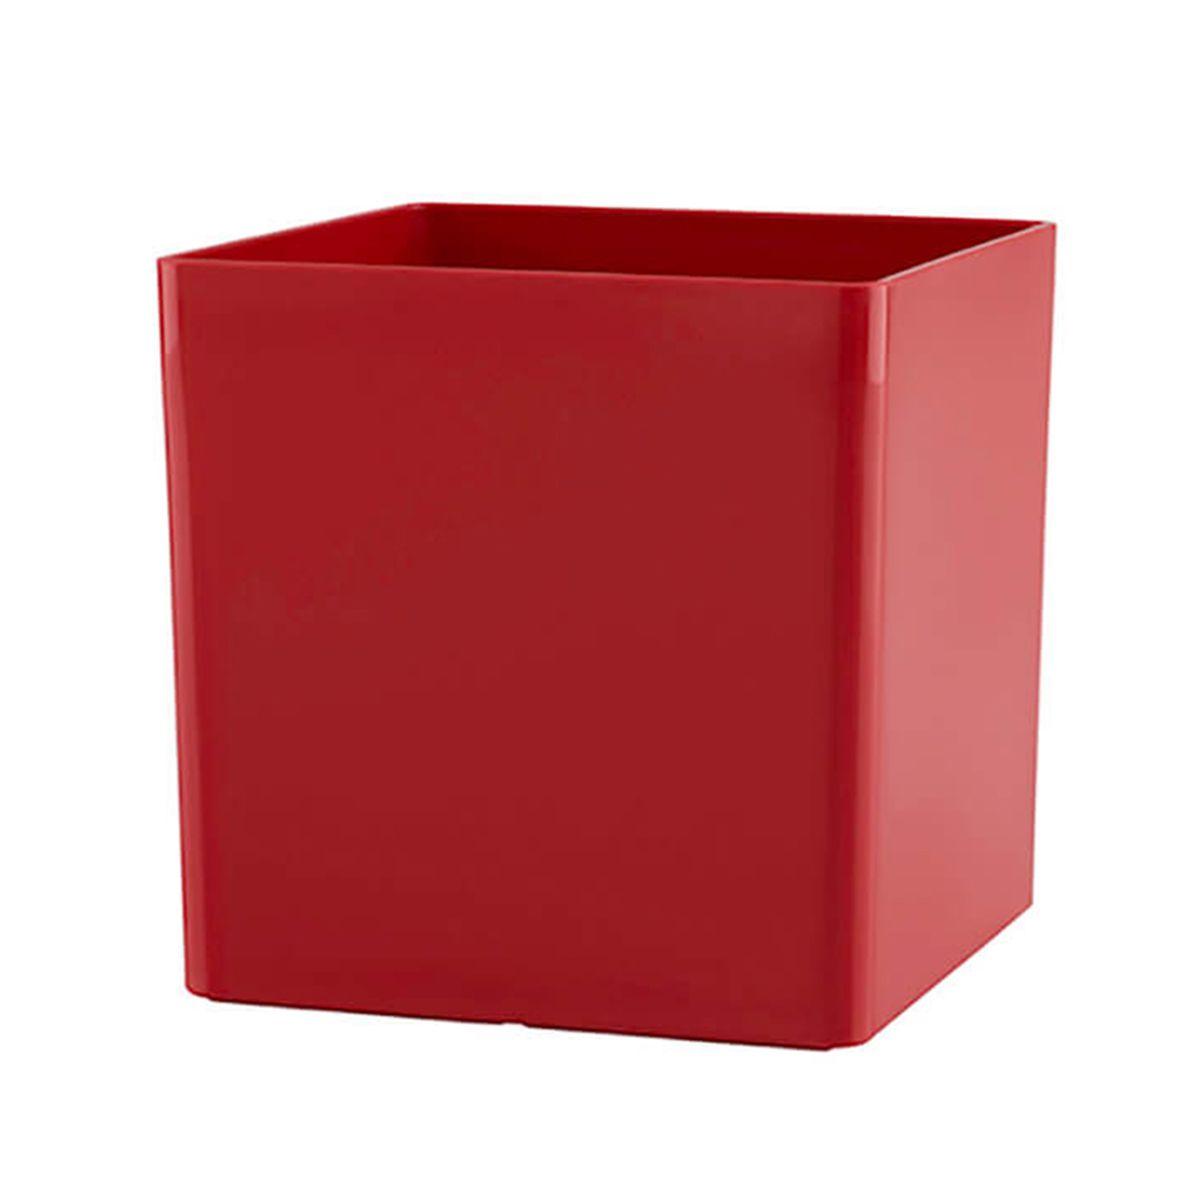 Vaso Cubo 17 x 17 cm Vermelho Vasart